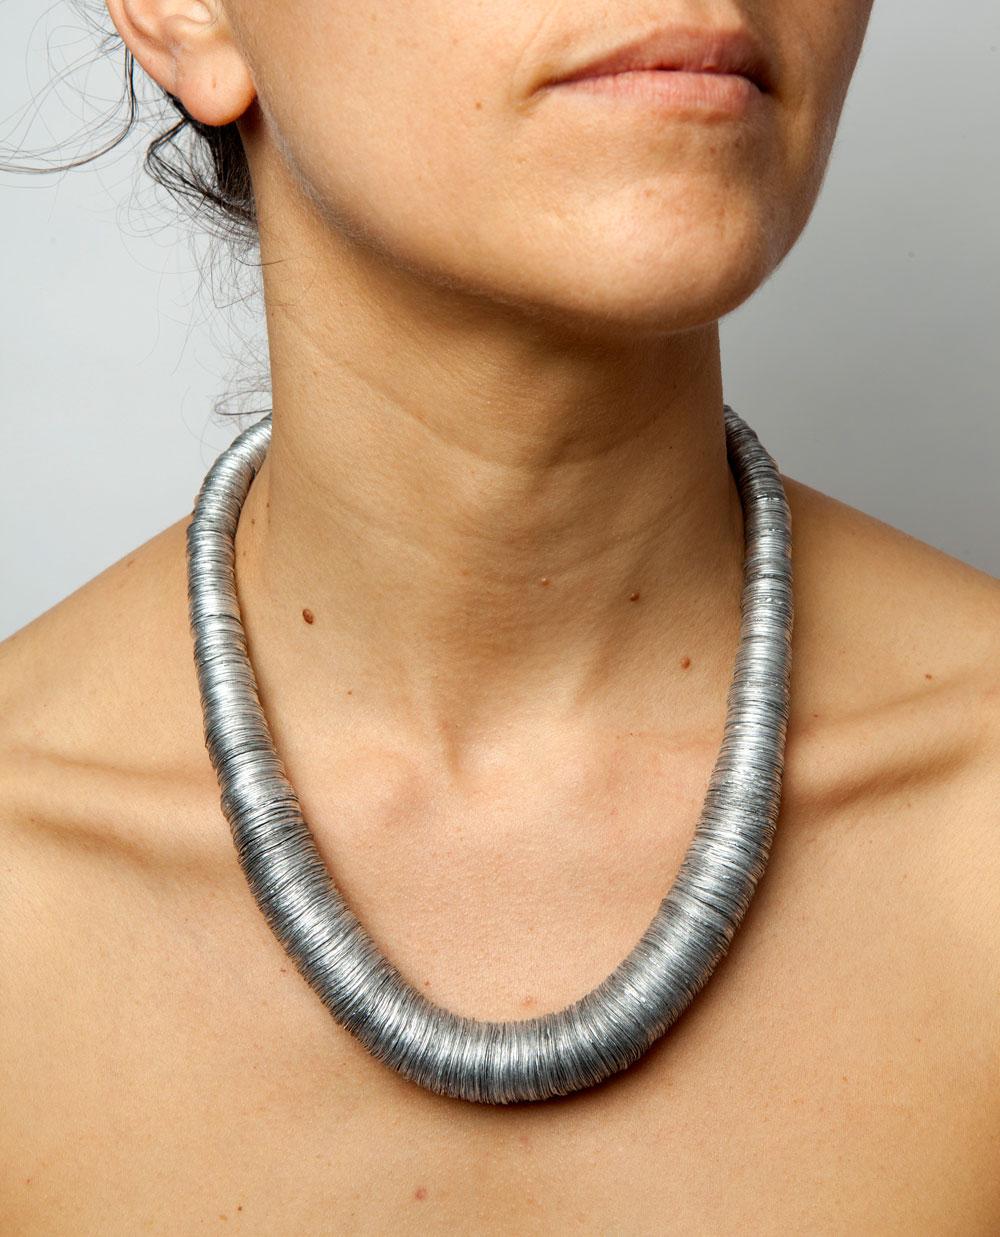 Barbara Schrobenhauser, Aluminium IV, halssieraad, 2015. Foto Barbara Schrobenhauser